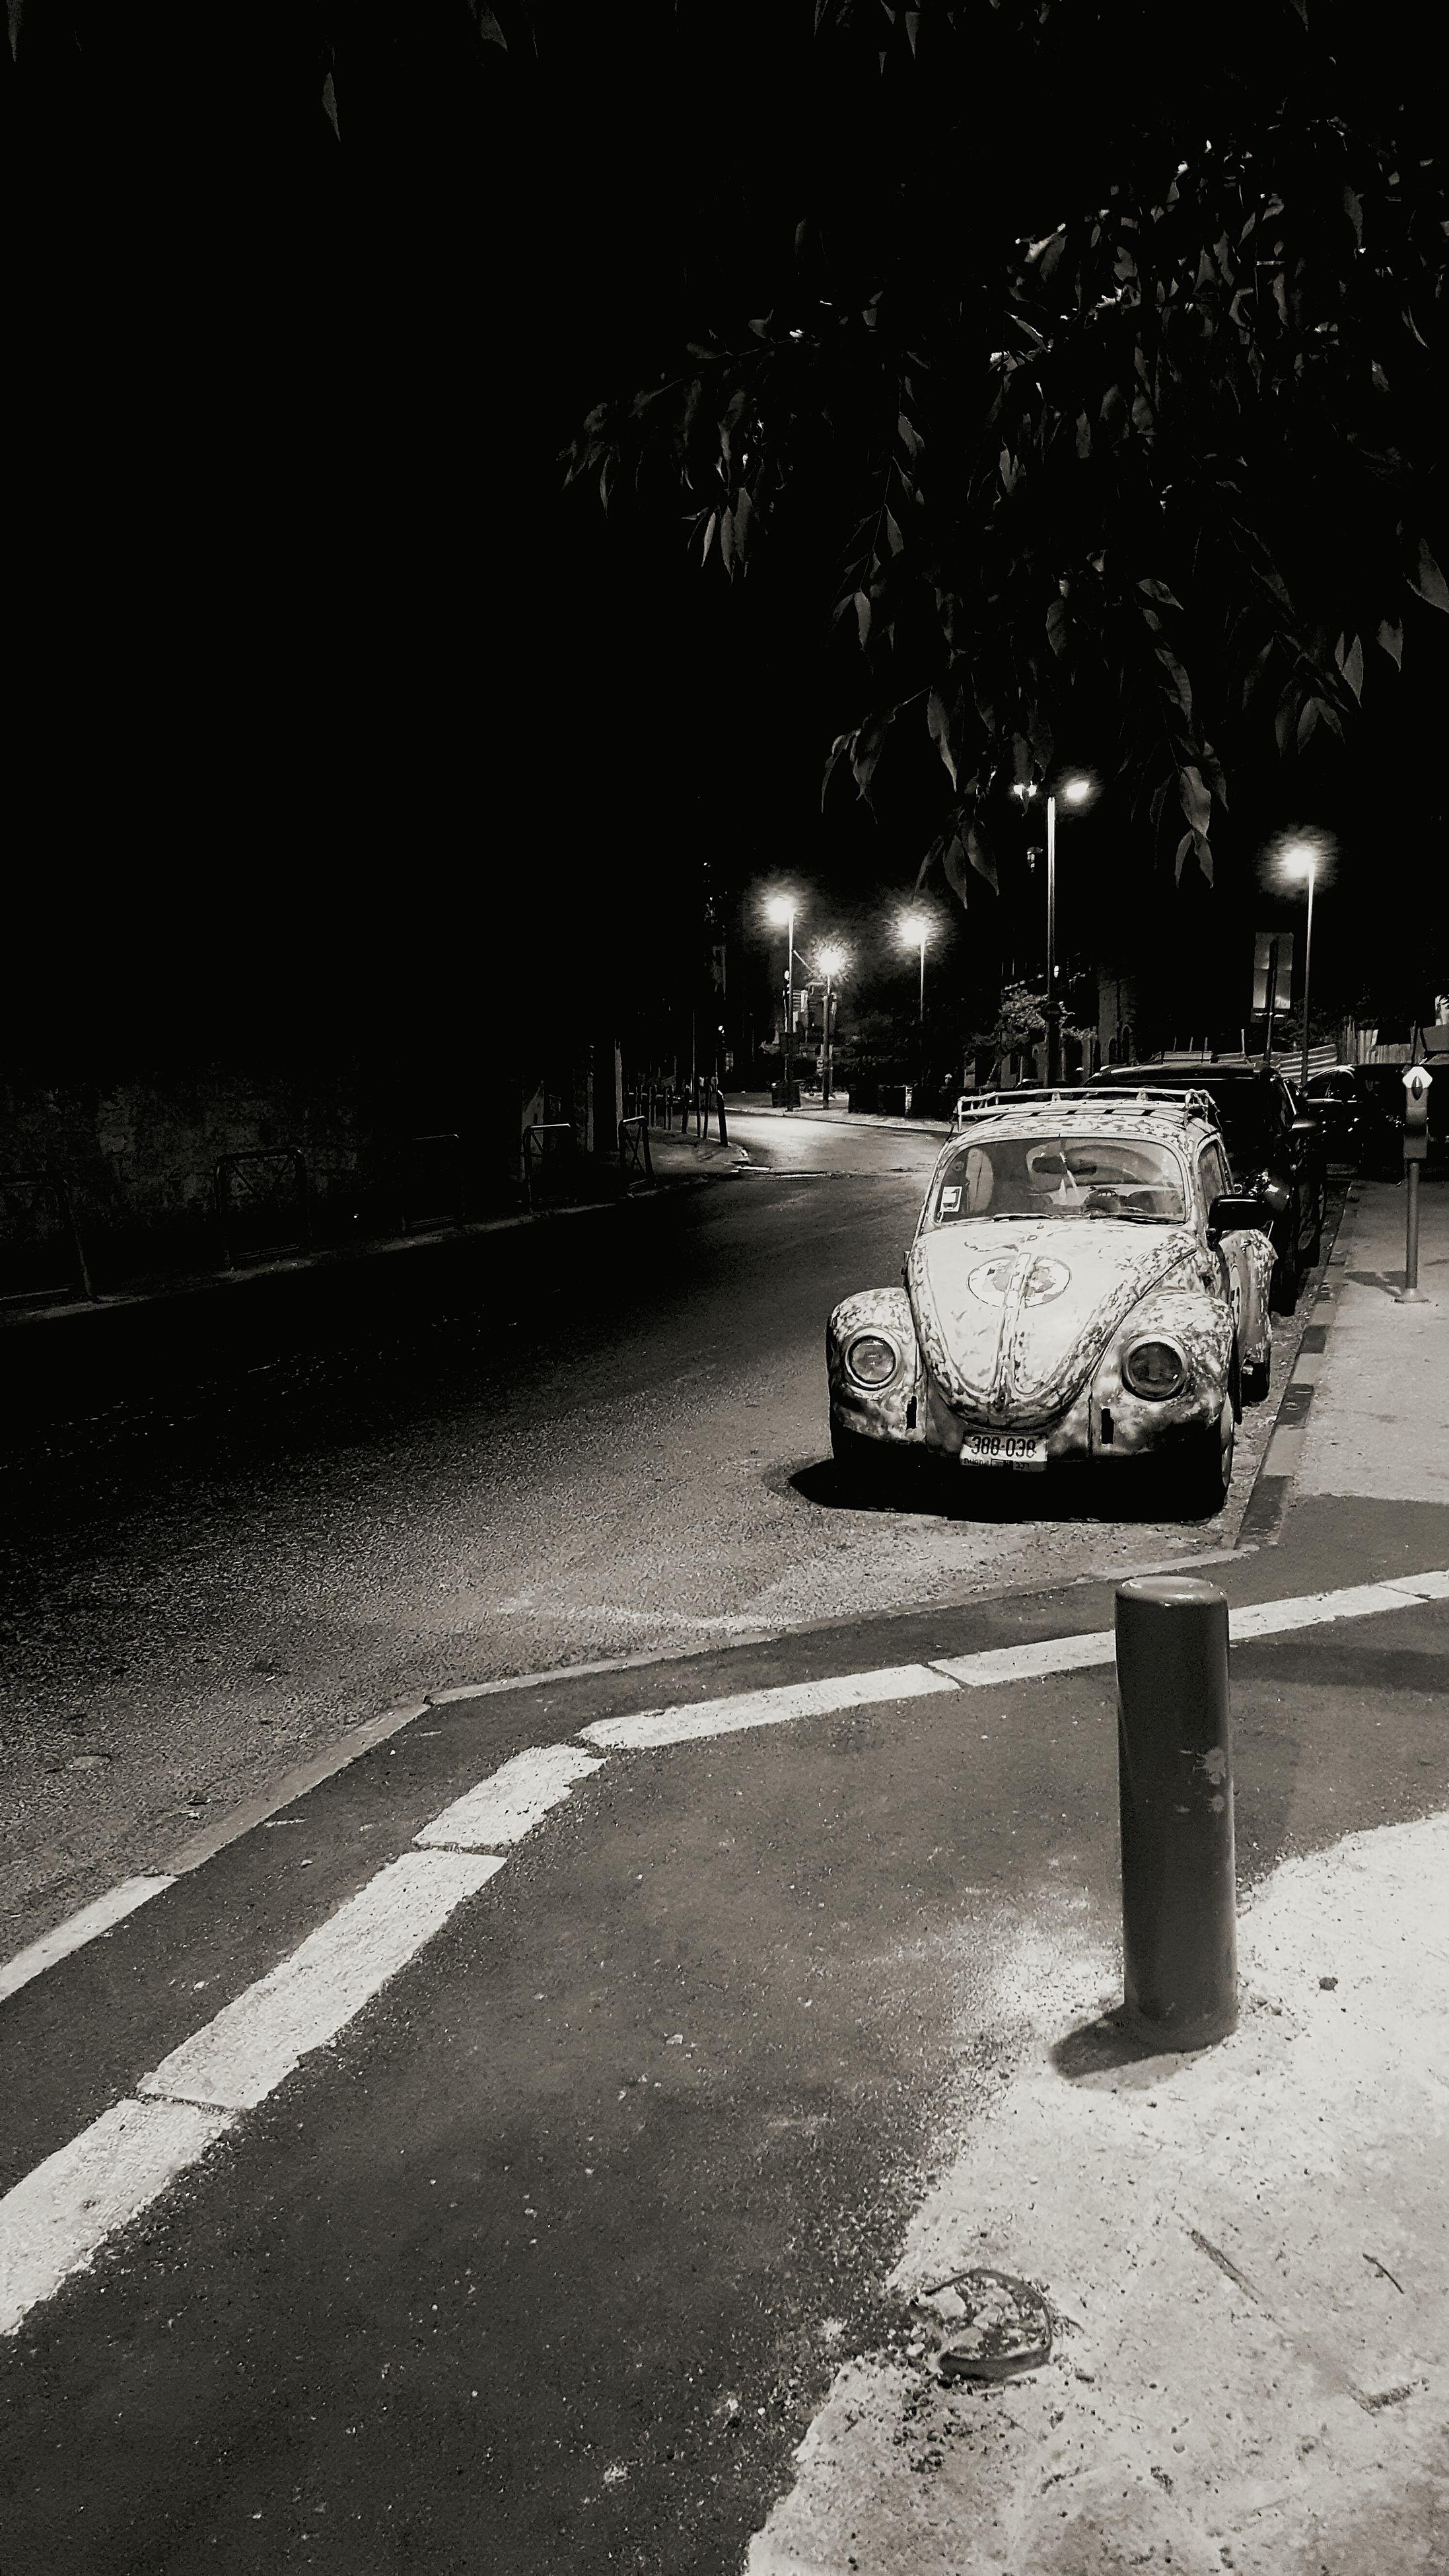 night, illuminated, road, street light, outdoors, dark, the way forward, no people, nature, empty, tranquility, sky, tranquil scene